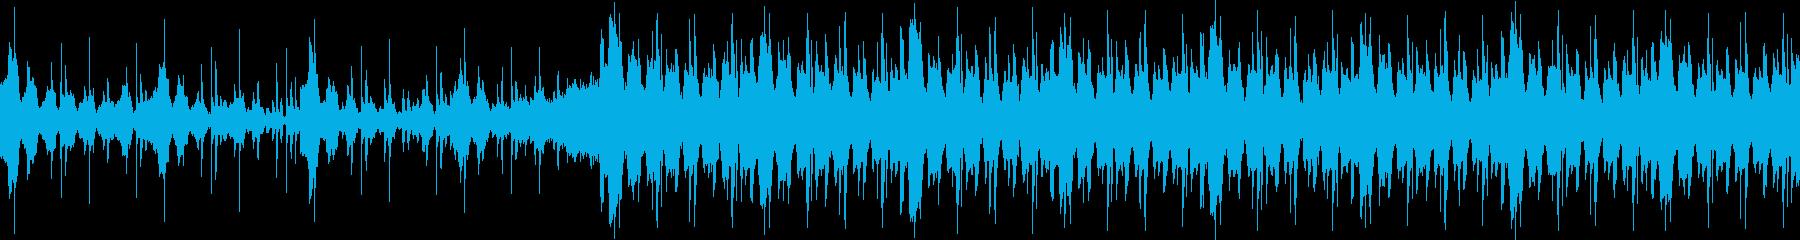 VP、CM、暖かい爽やかな透明感ループbの再生済みの波形